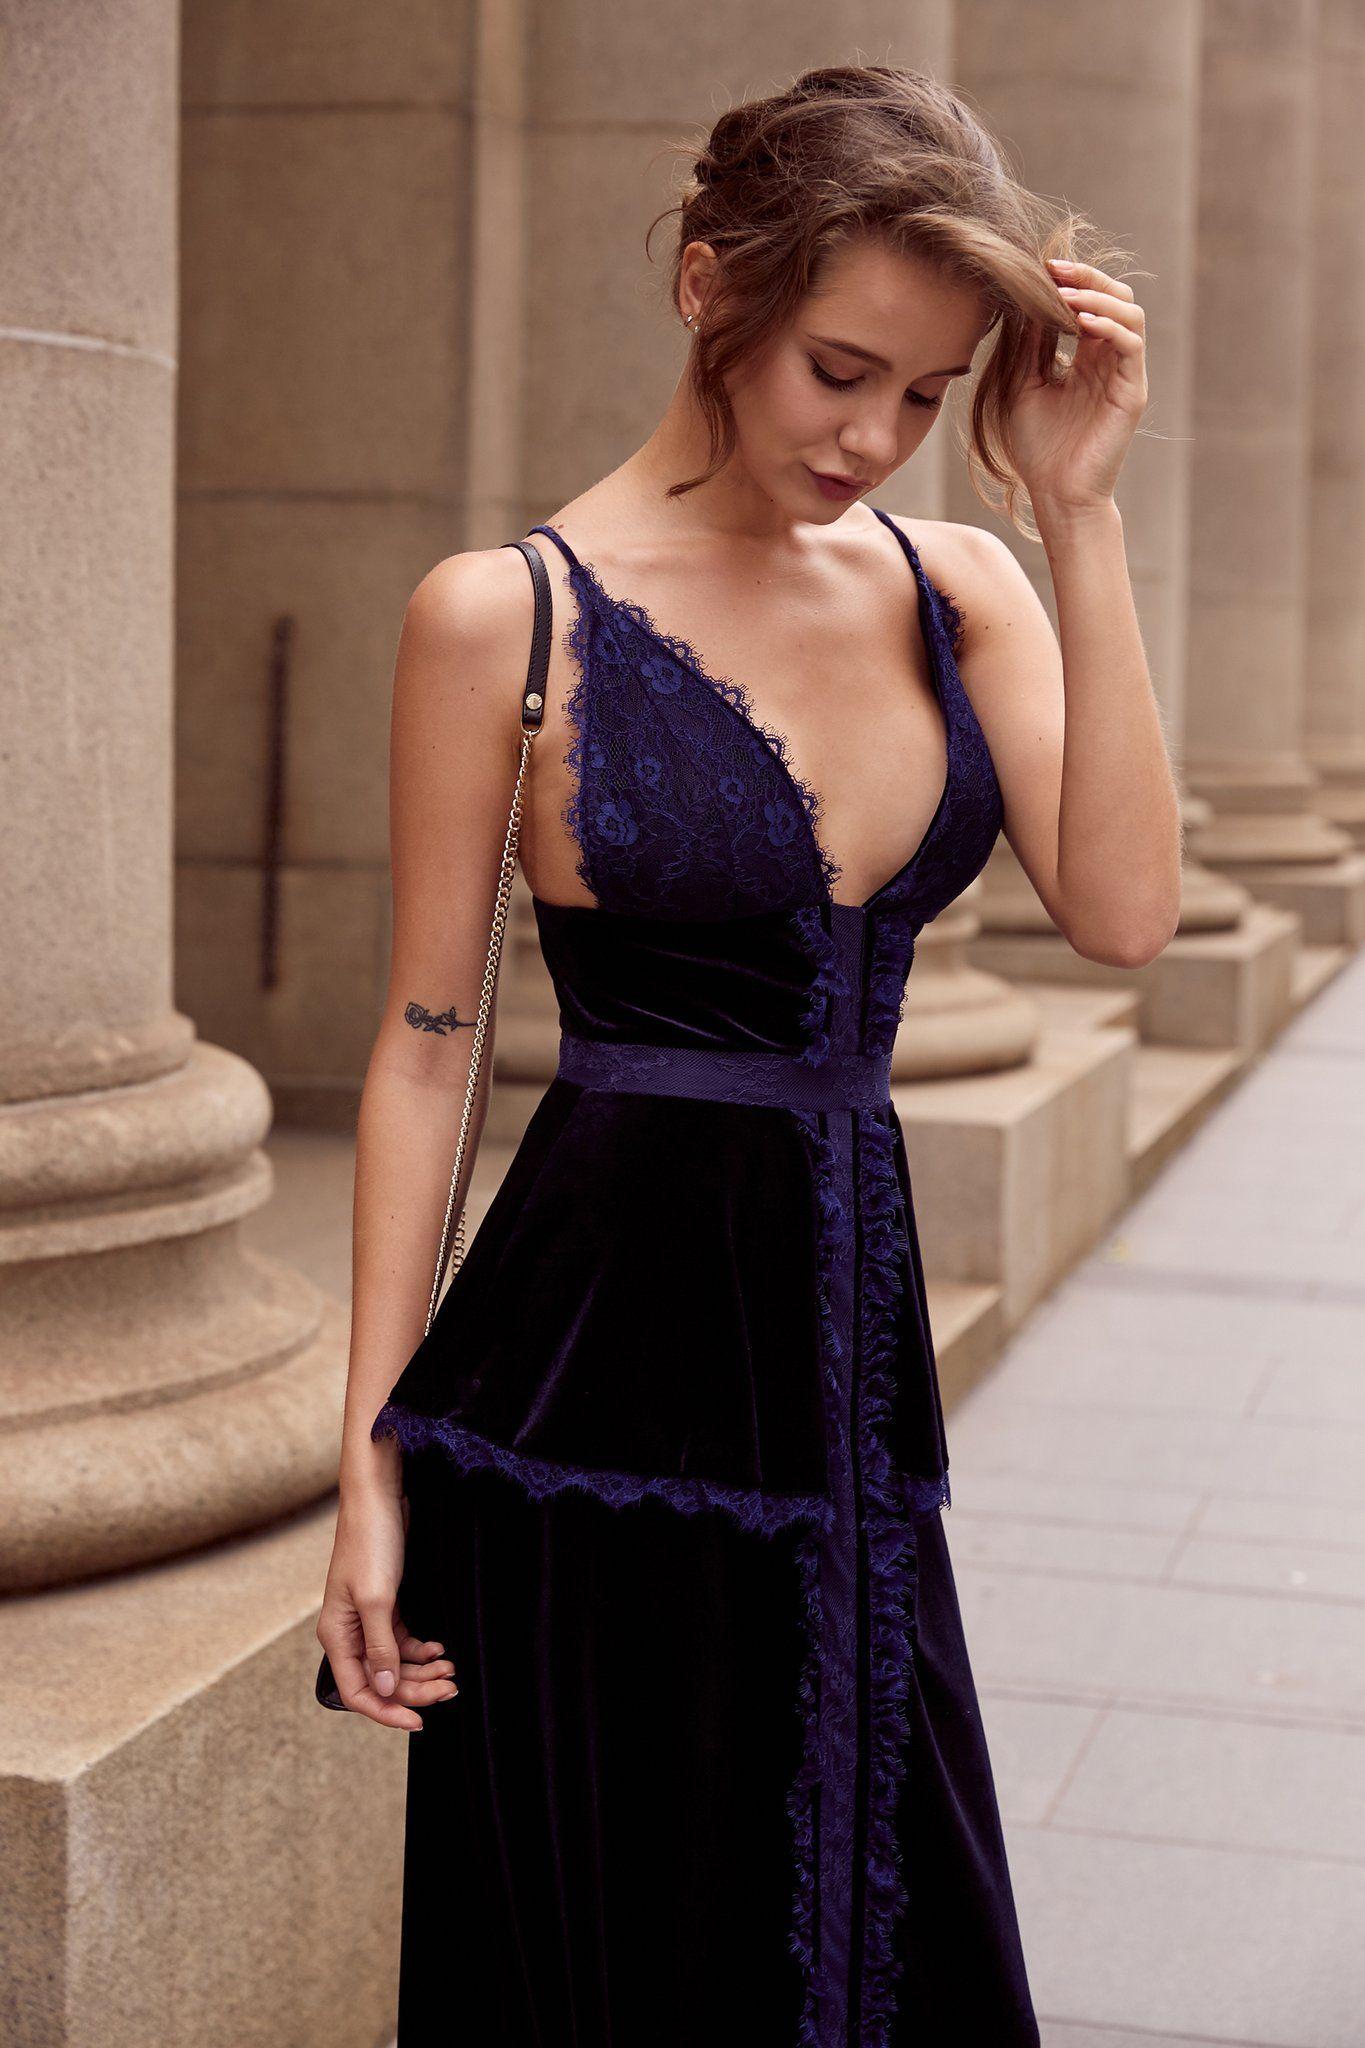 Velvet and lace lingerie inspired cocktail dress 6489f4db8